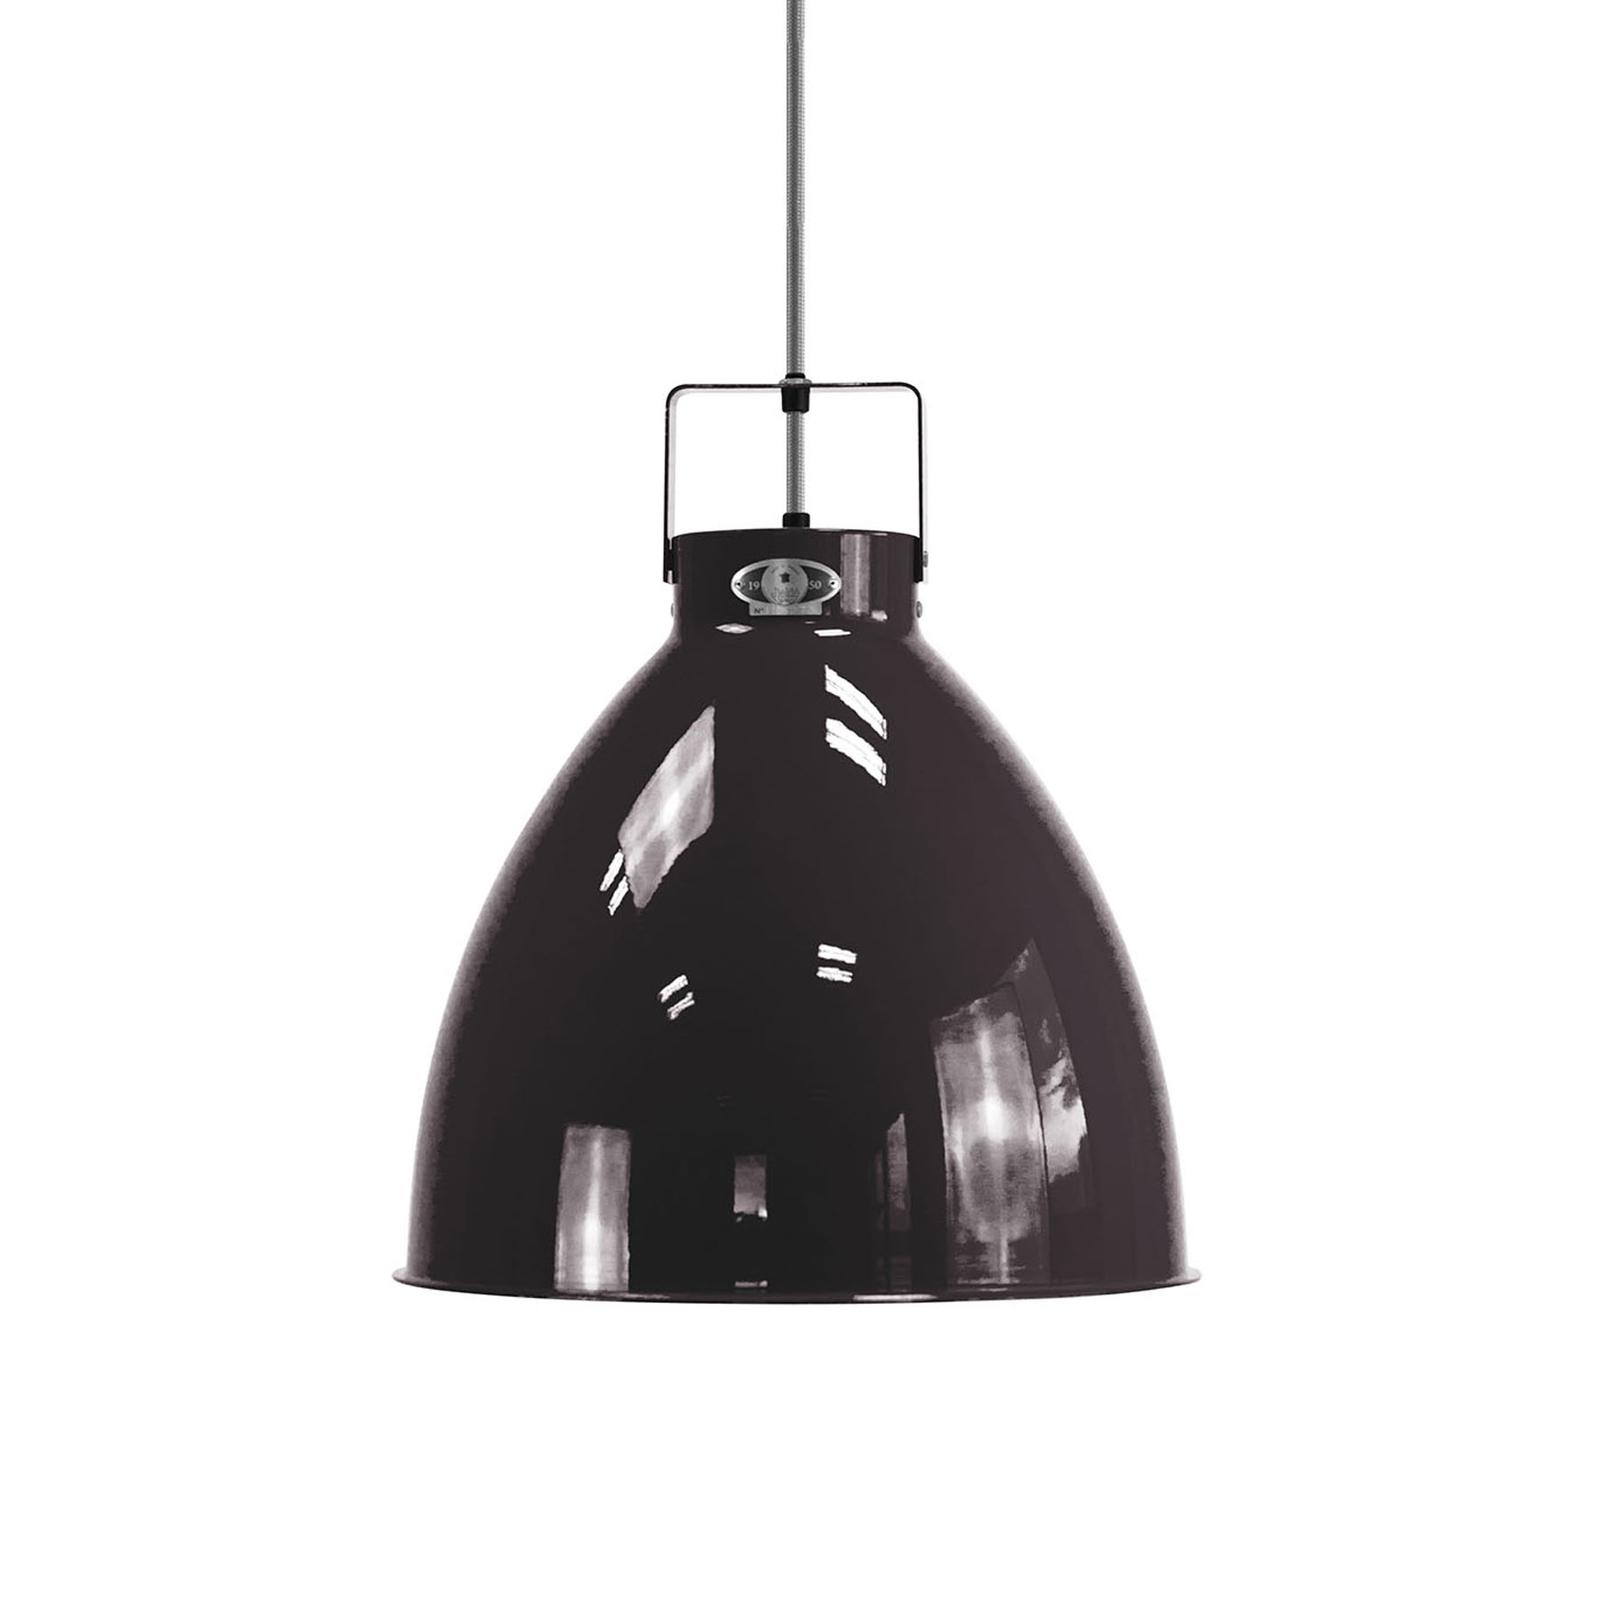 Jieldé Augustin A360 Hängelampe schwarz glänzend